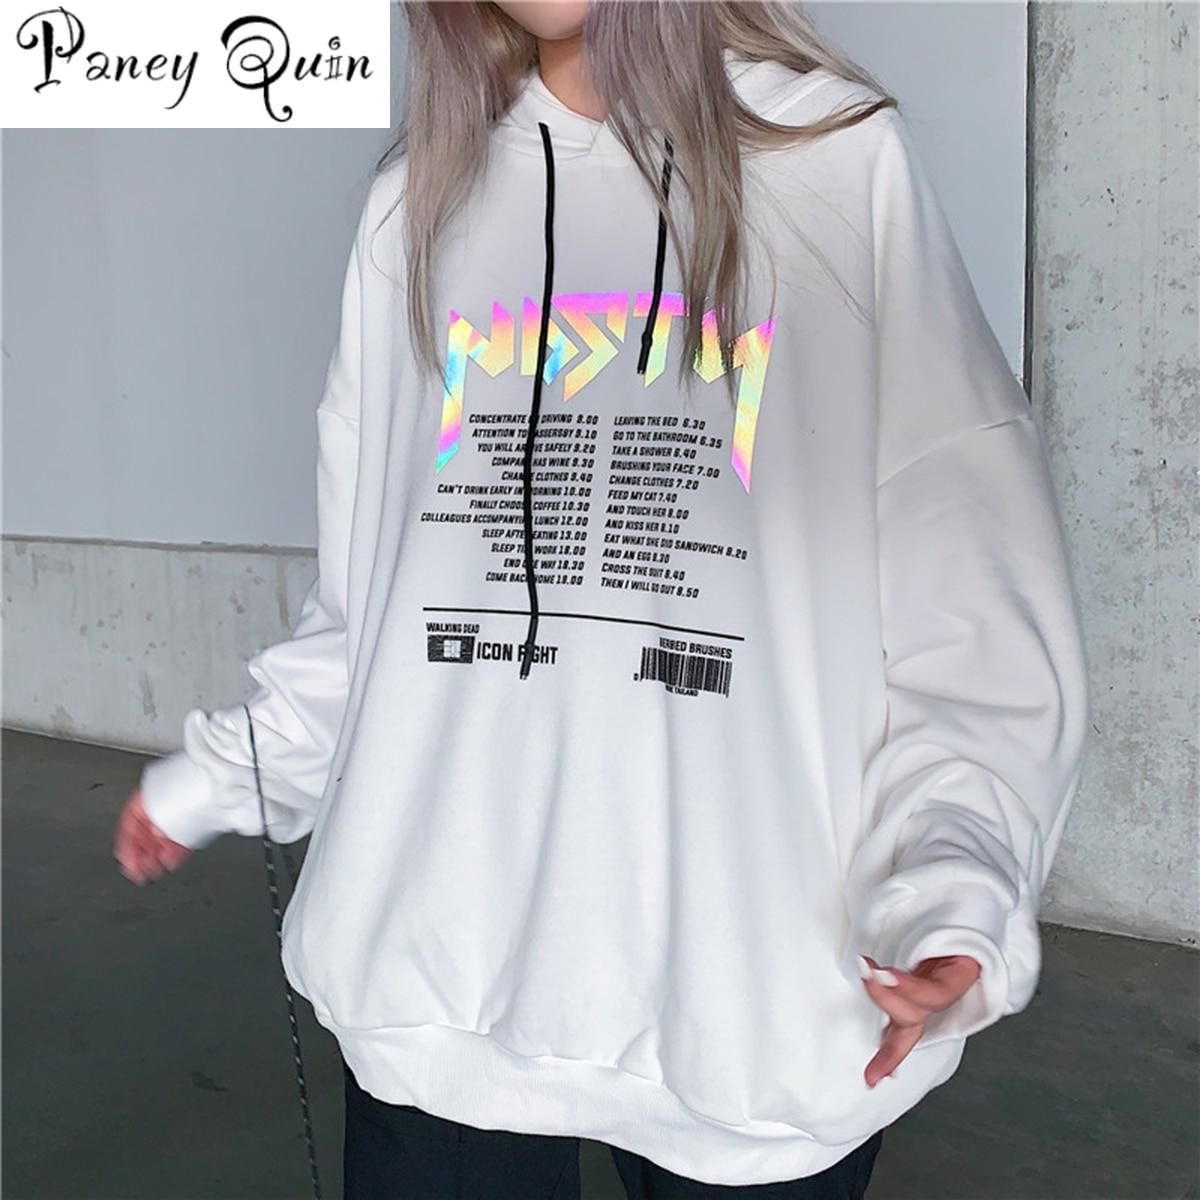 Reflective Letter Print Sweatshirt Hoodies WOMEN Korean Casual Pullover Cotton Oversized Hoodie Streetwear For Girls